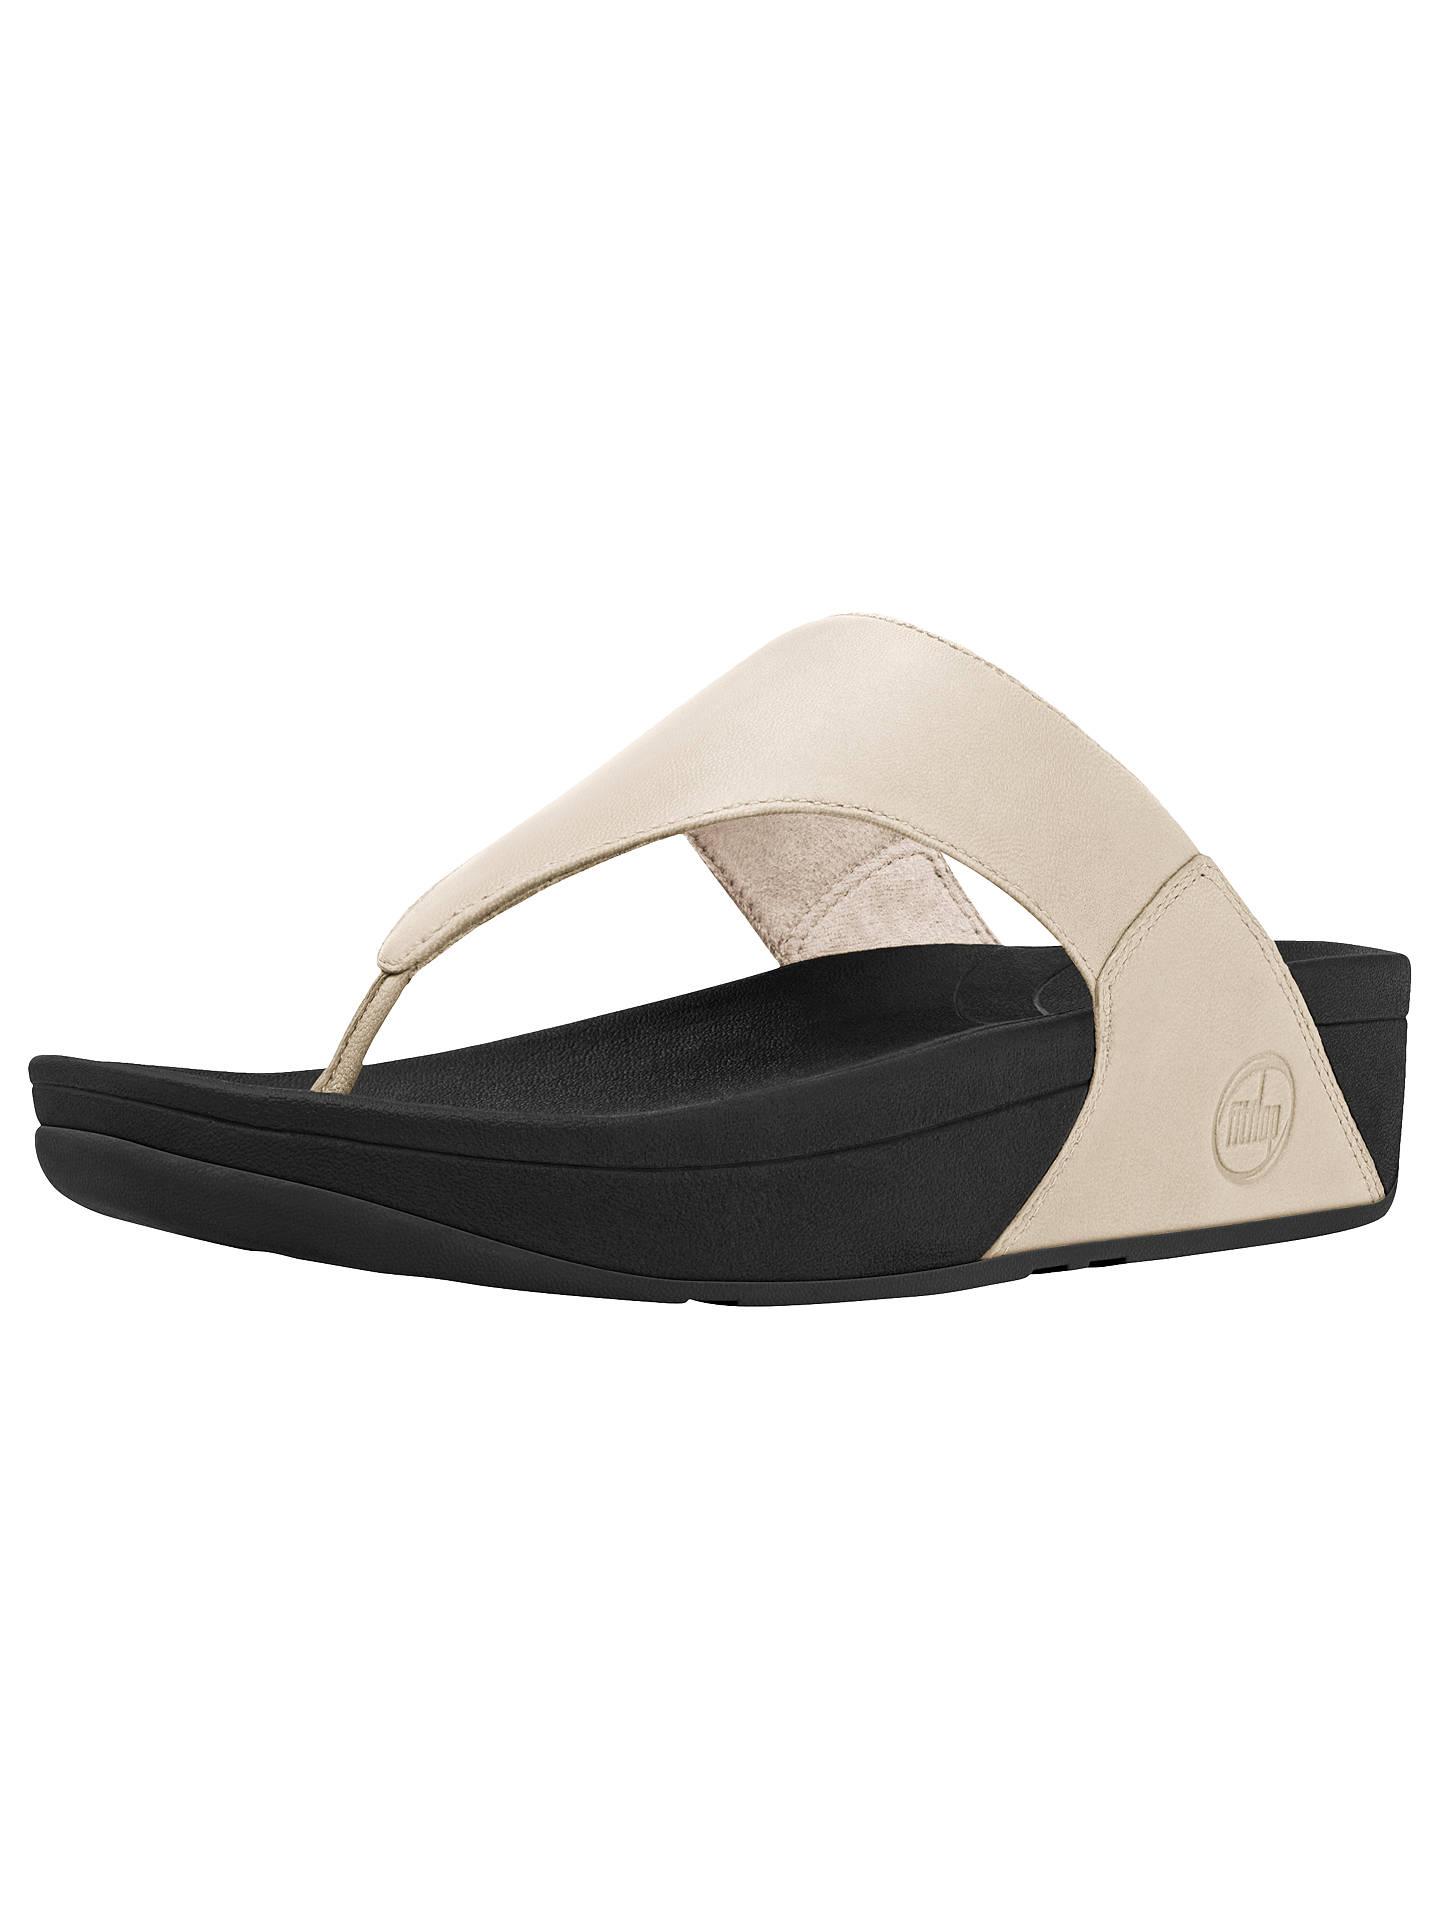 436ee84671329 FitFlop Lulu Leather Flip Flops at John Lewis   Partners